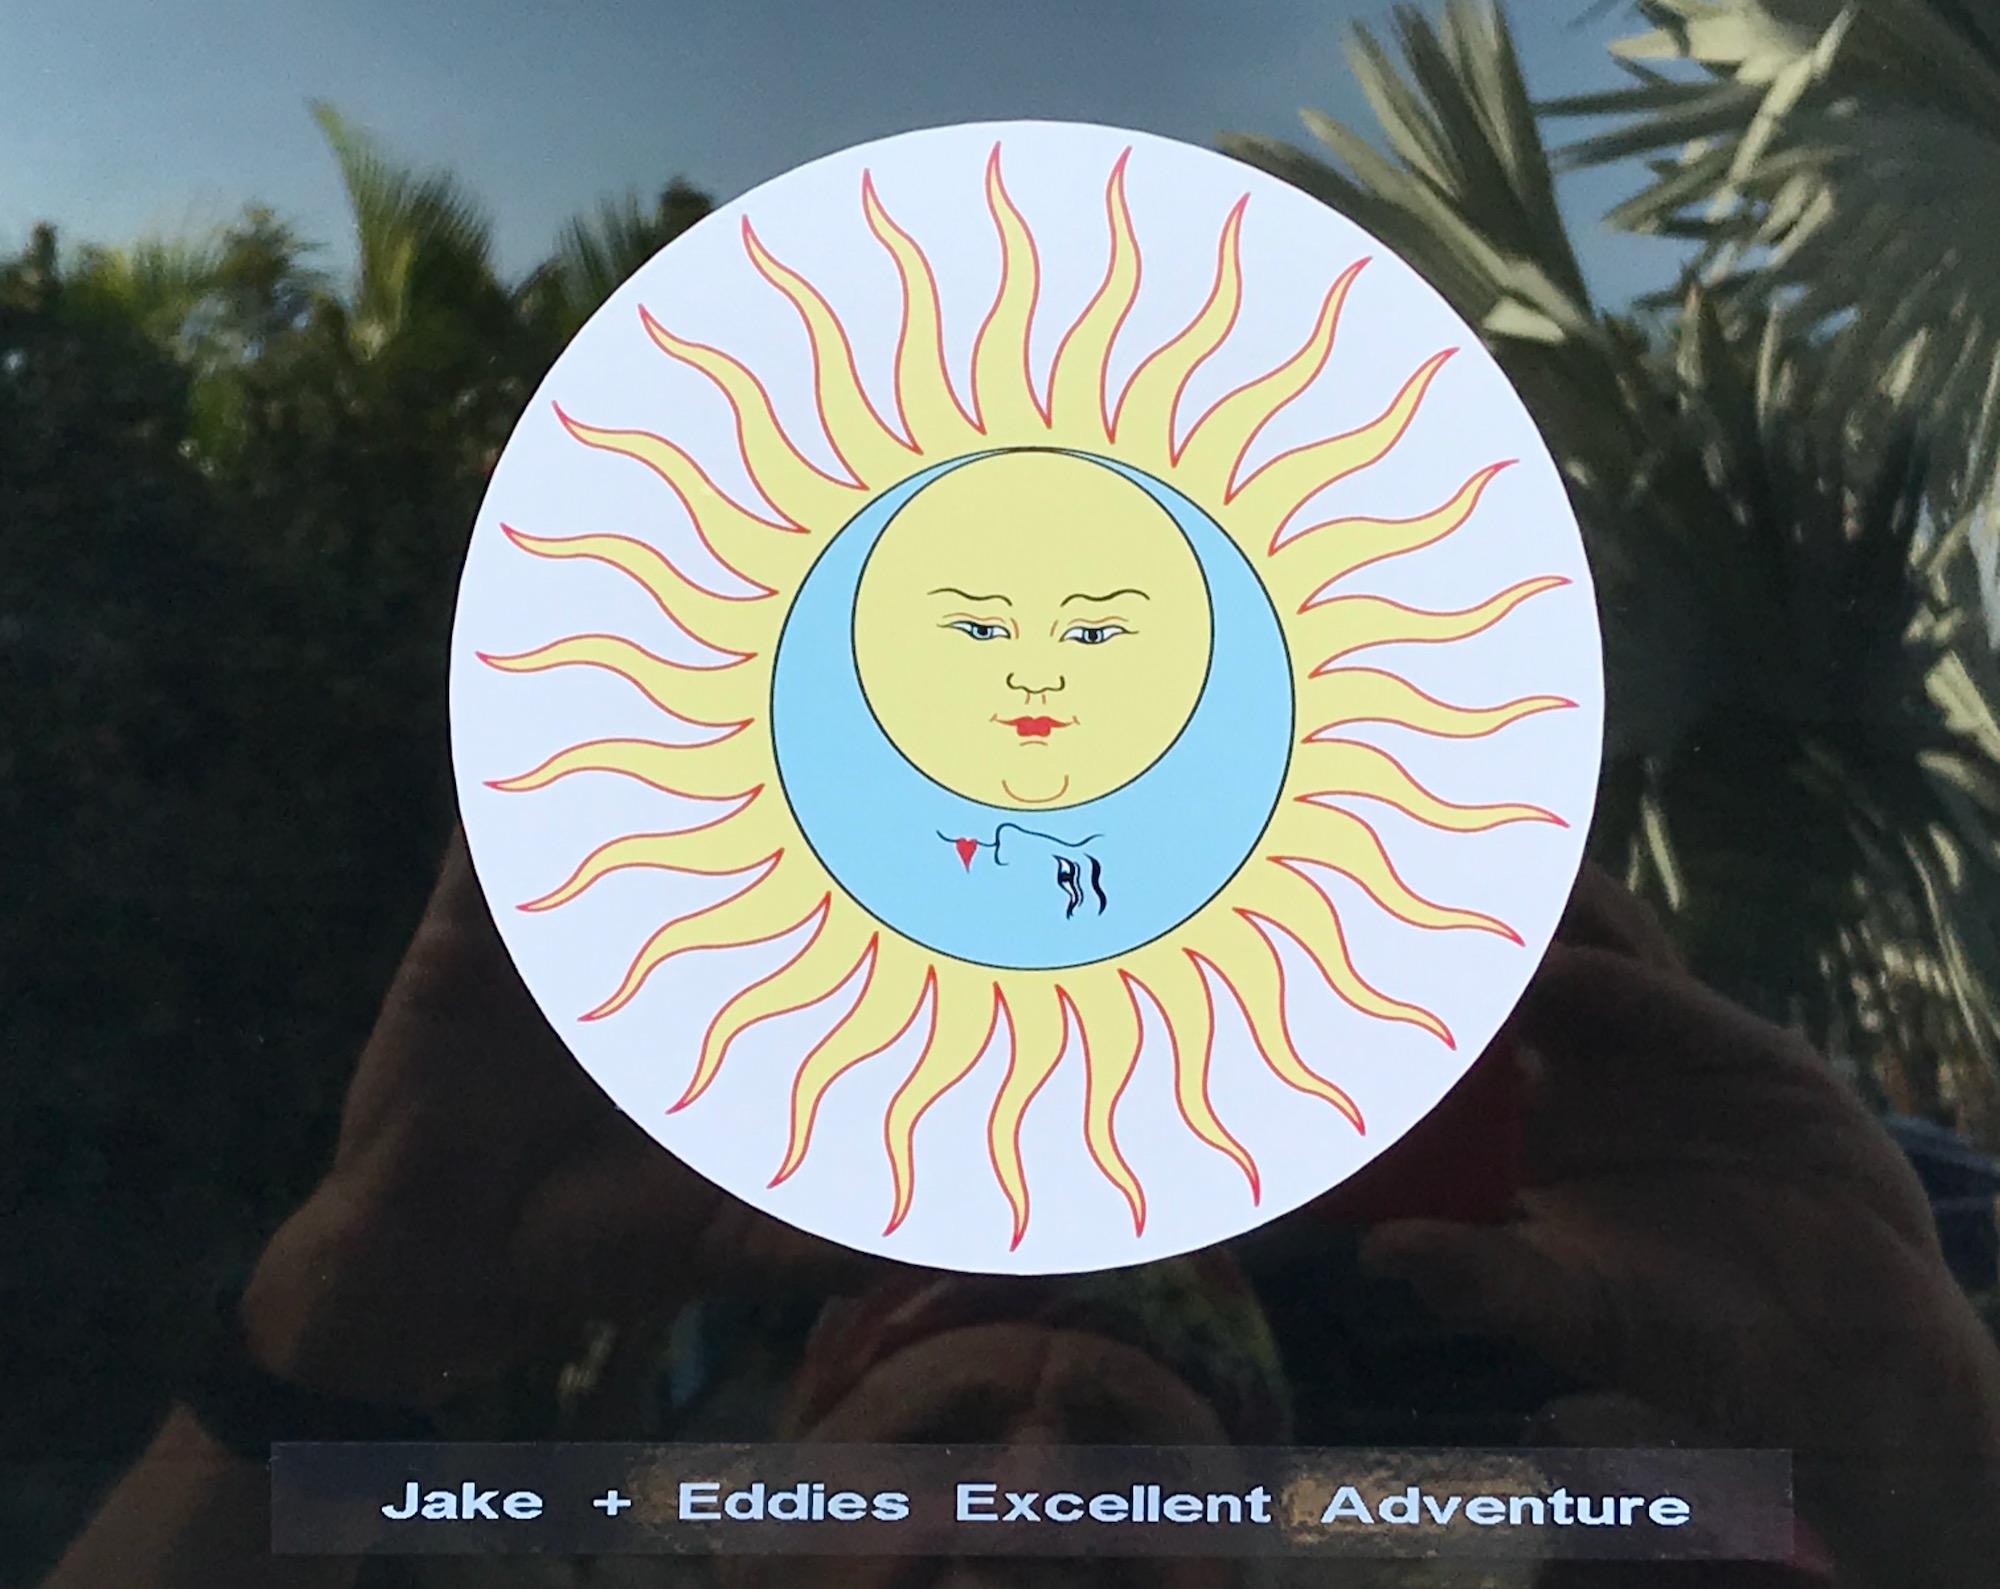 The Excellent Adventure